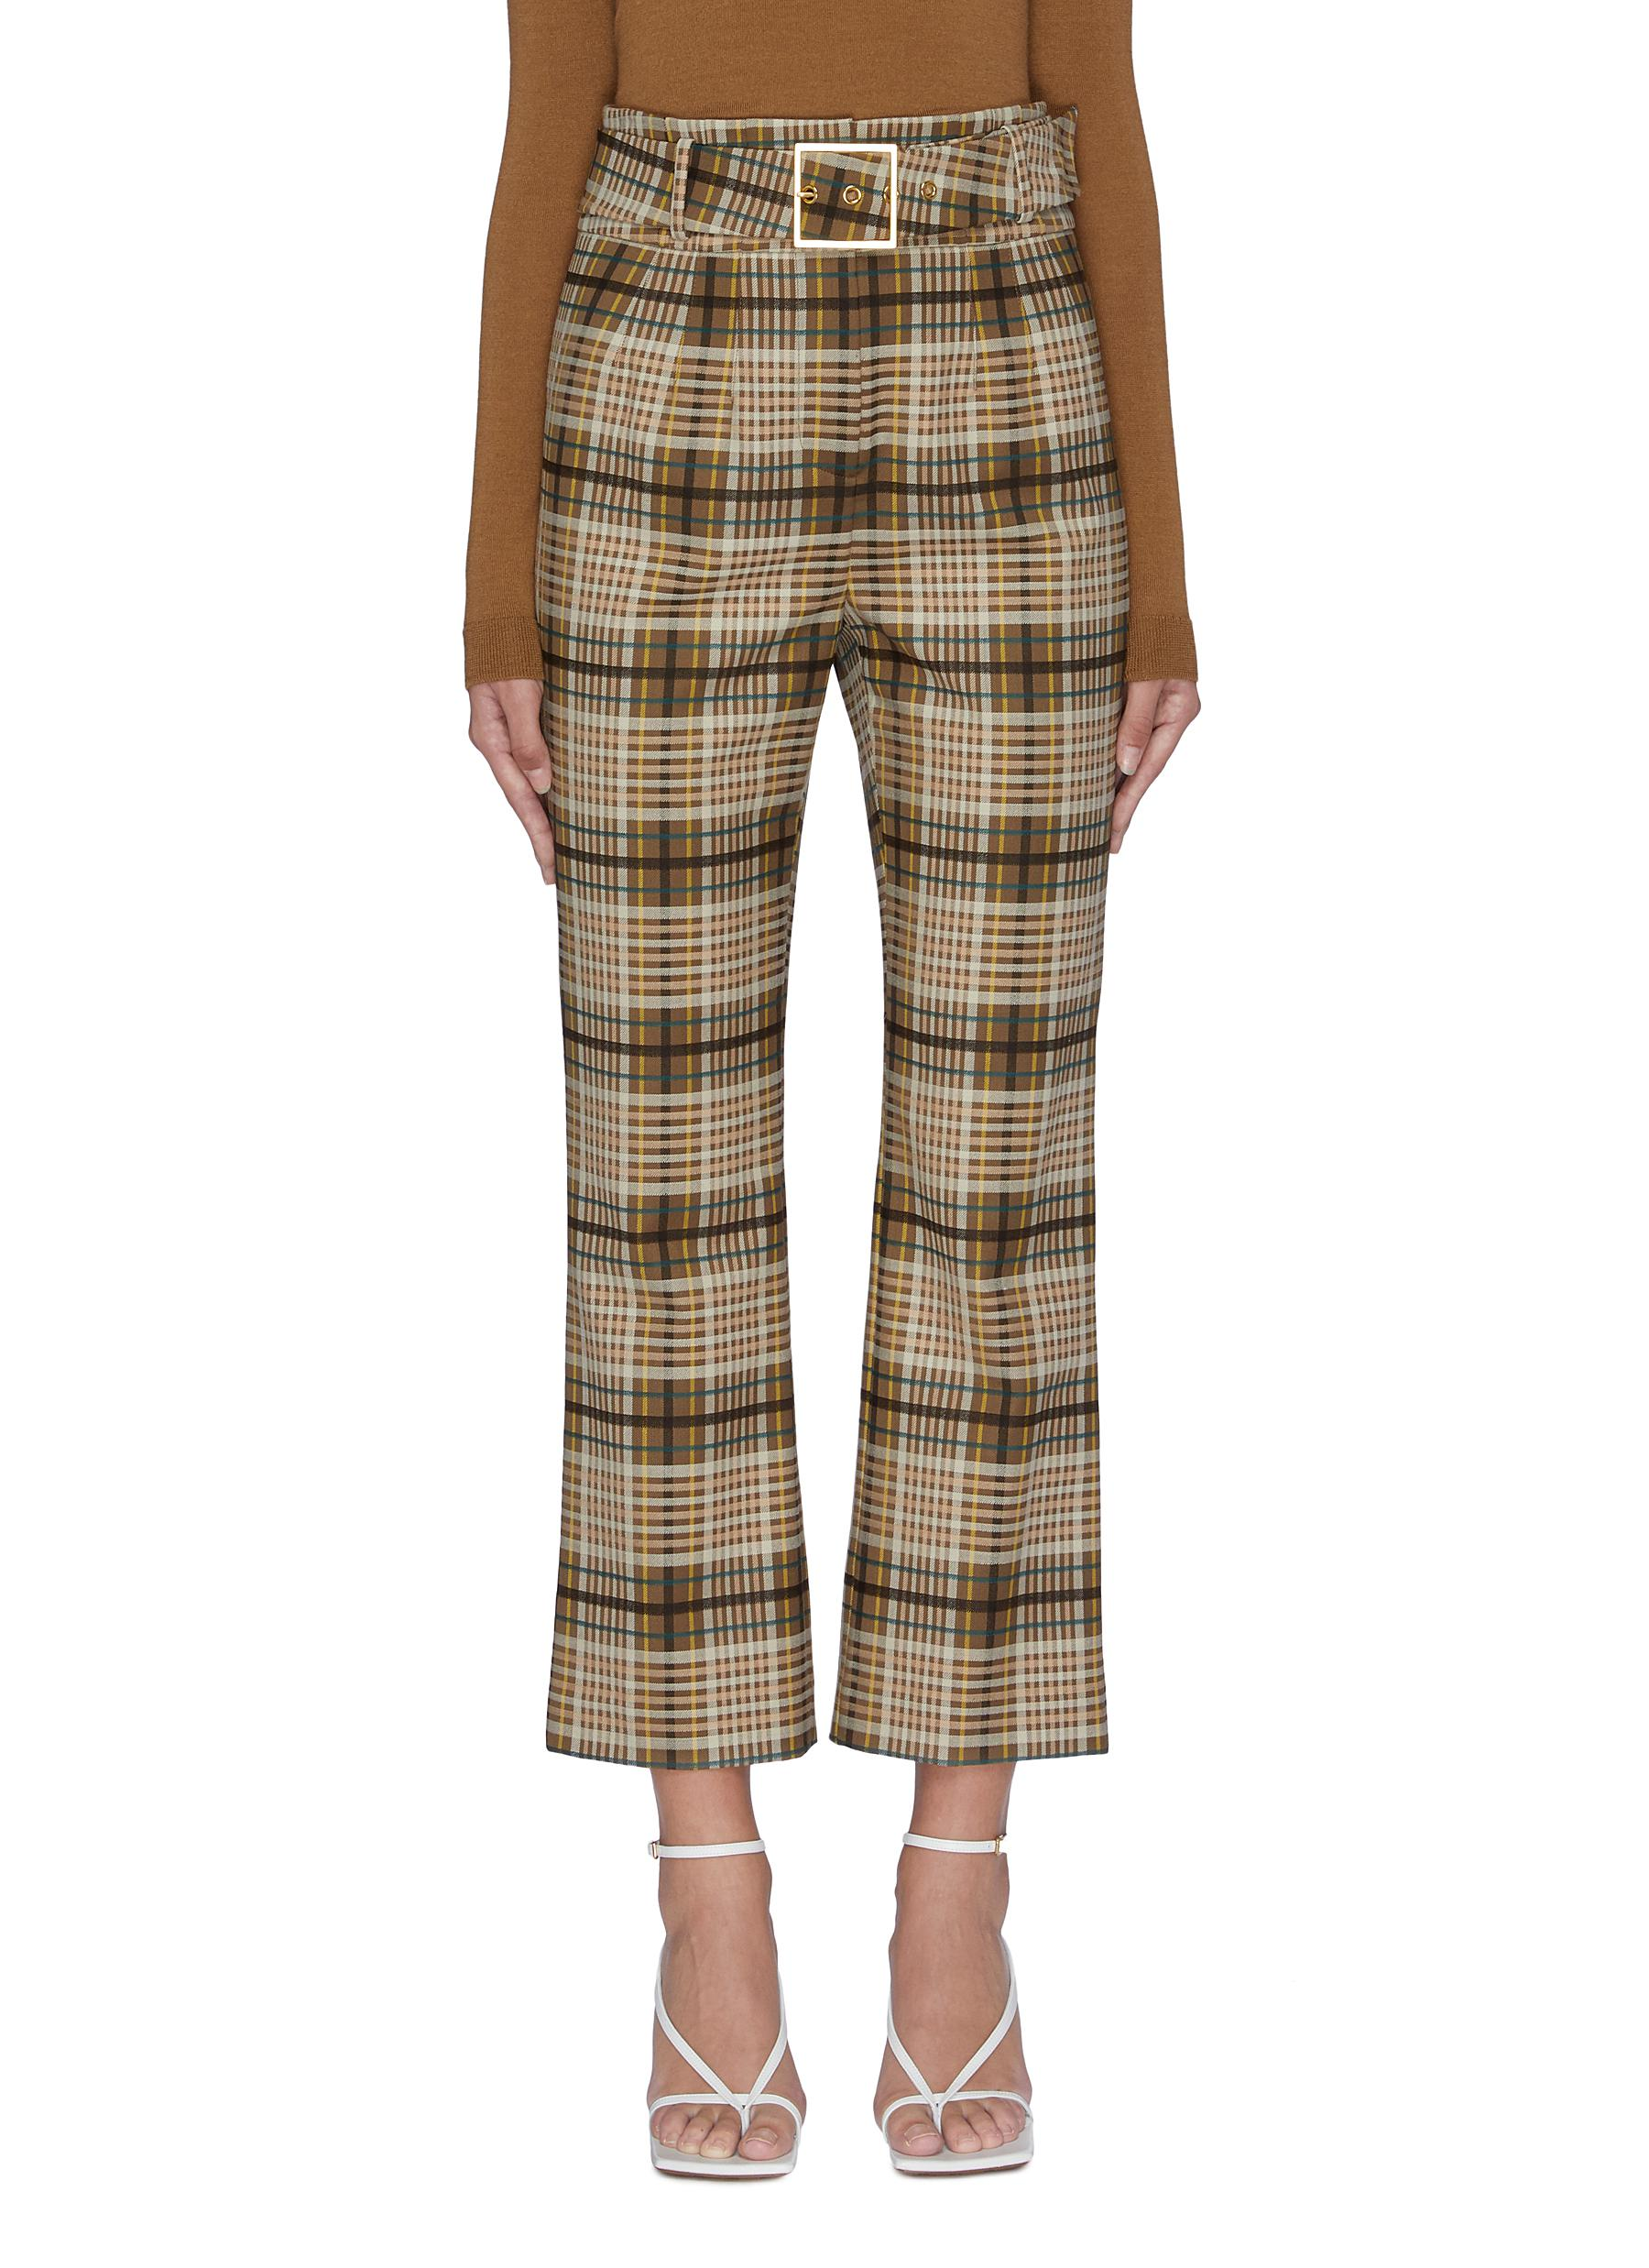 Belted tartan plaid cigarette pants by Jonathan Simkhai